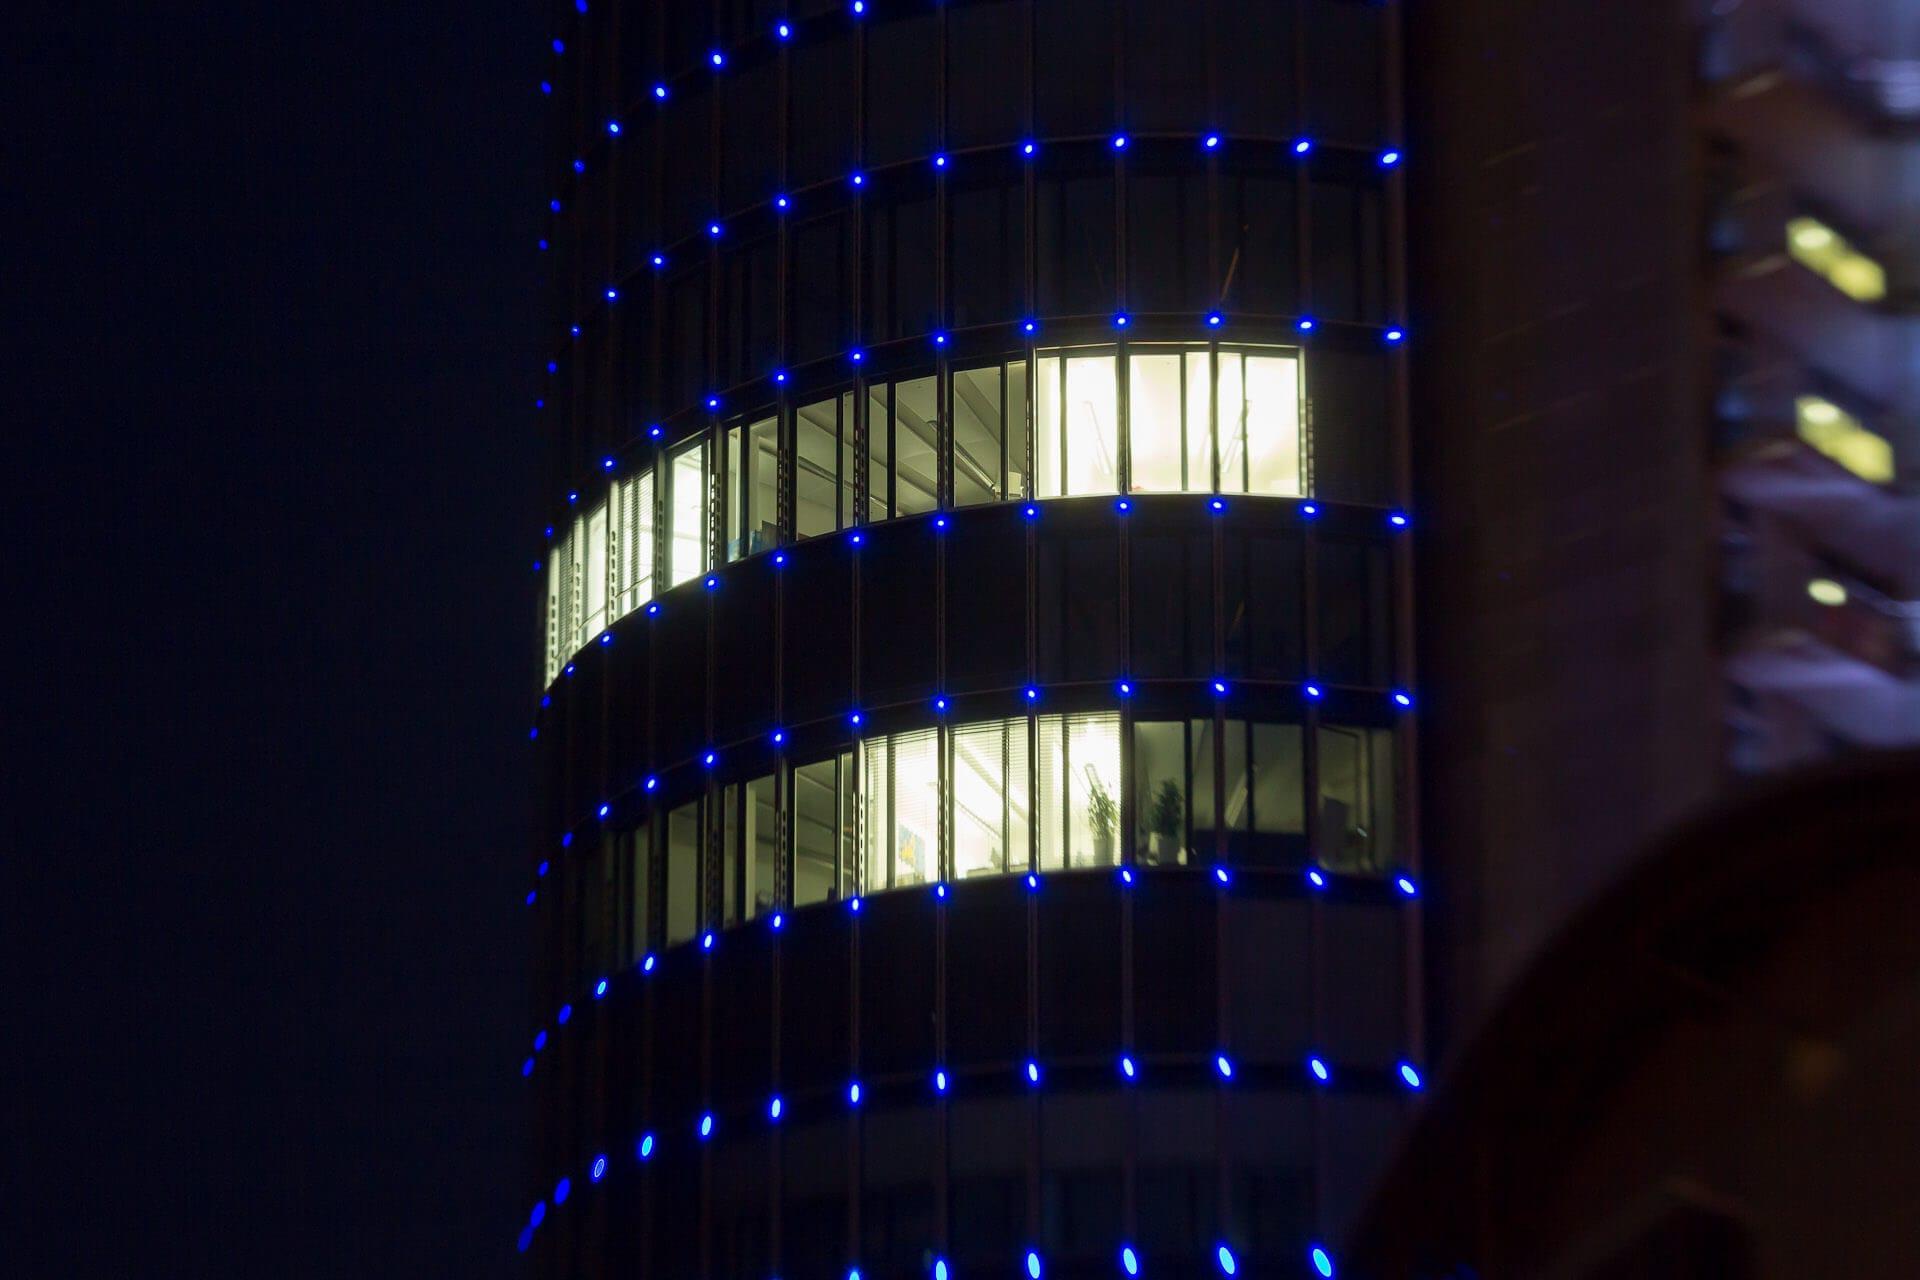 Central Tower – Firmensitz der Pentos AG - Christian Weber Photo | München